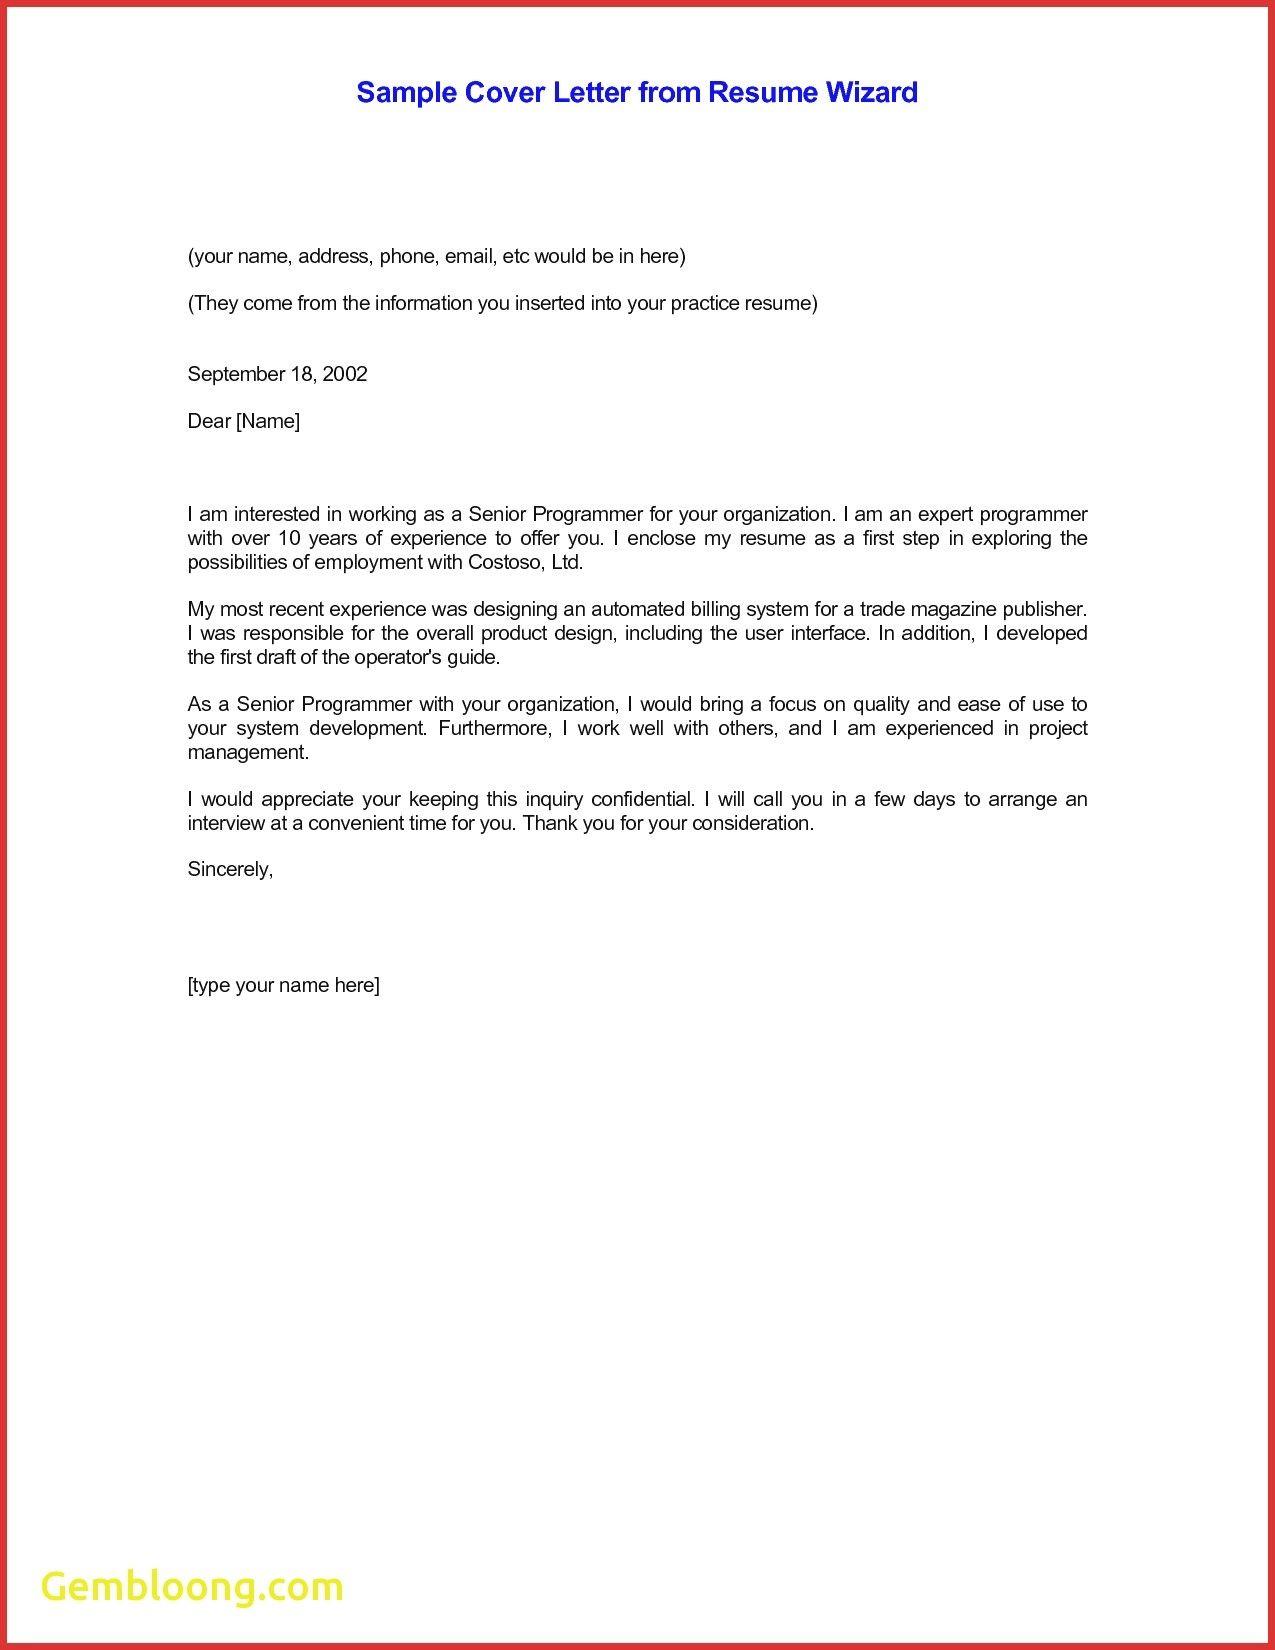 Email cv cover letter template cover letter for resume